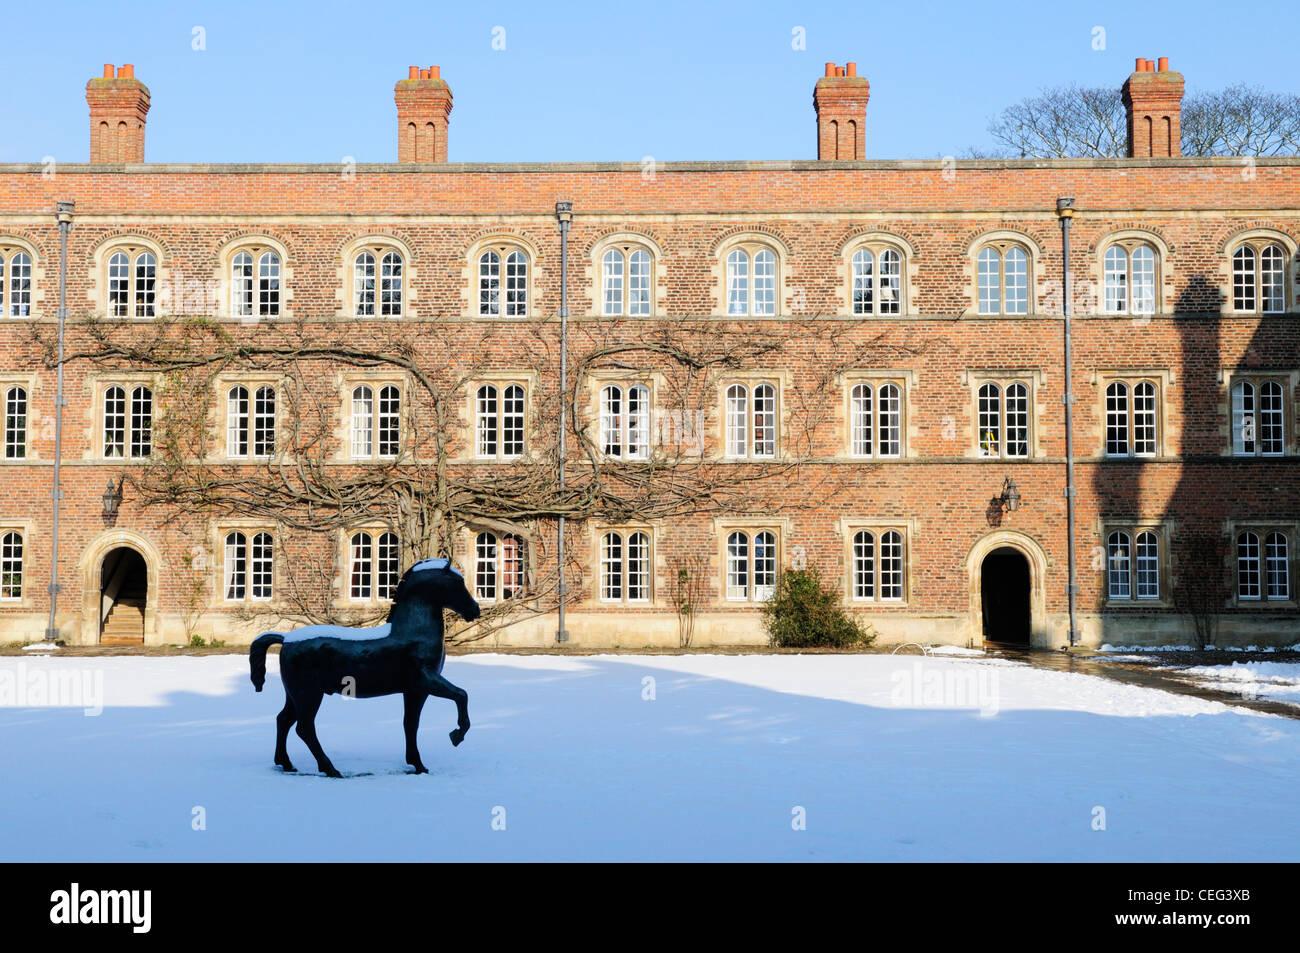 Jesus College in Winter, Cambridge, England, UK - Stock Image